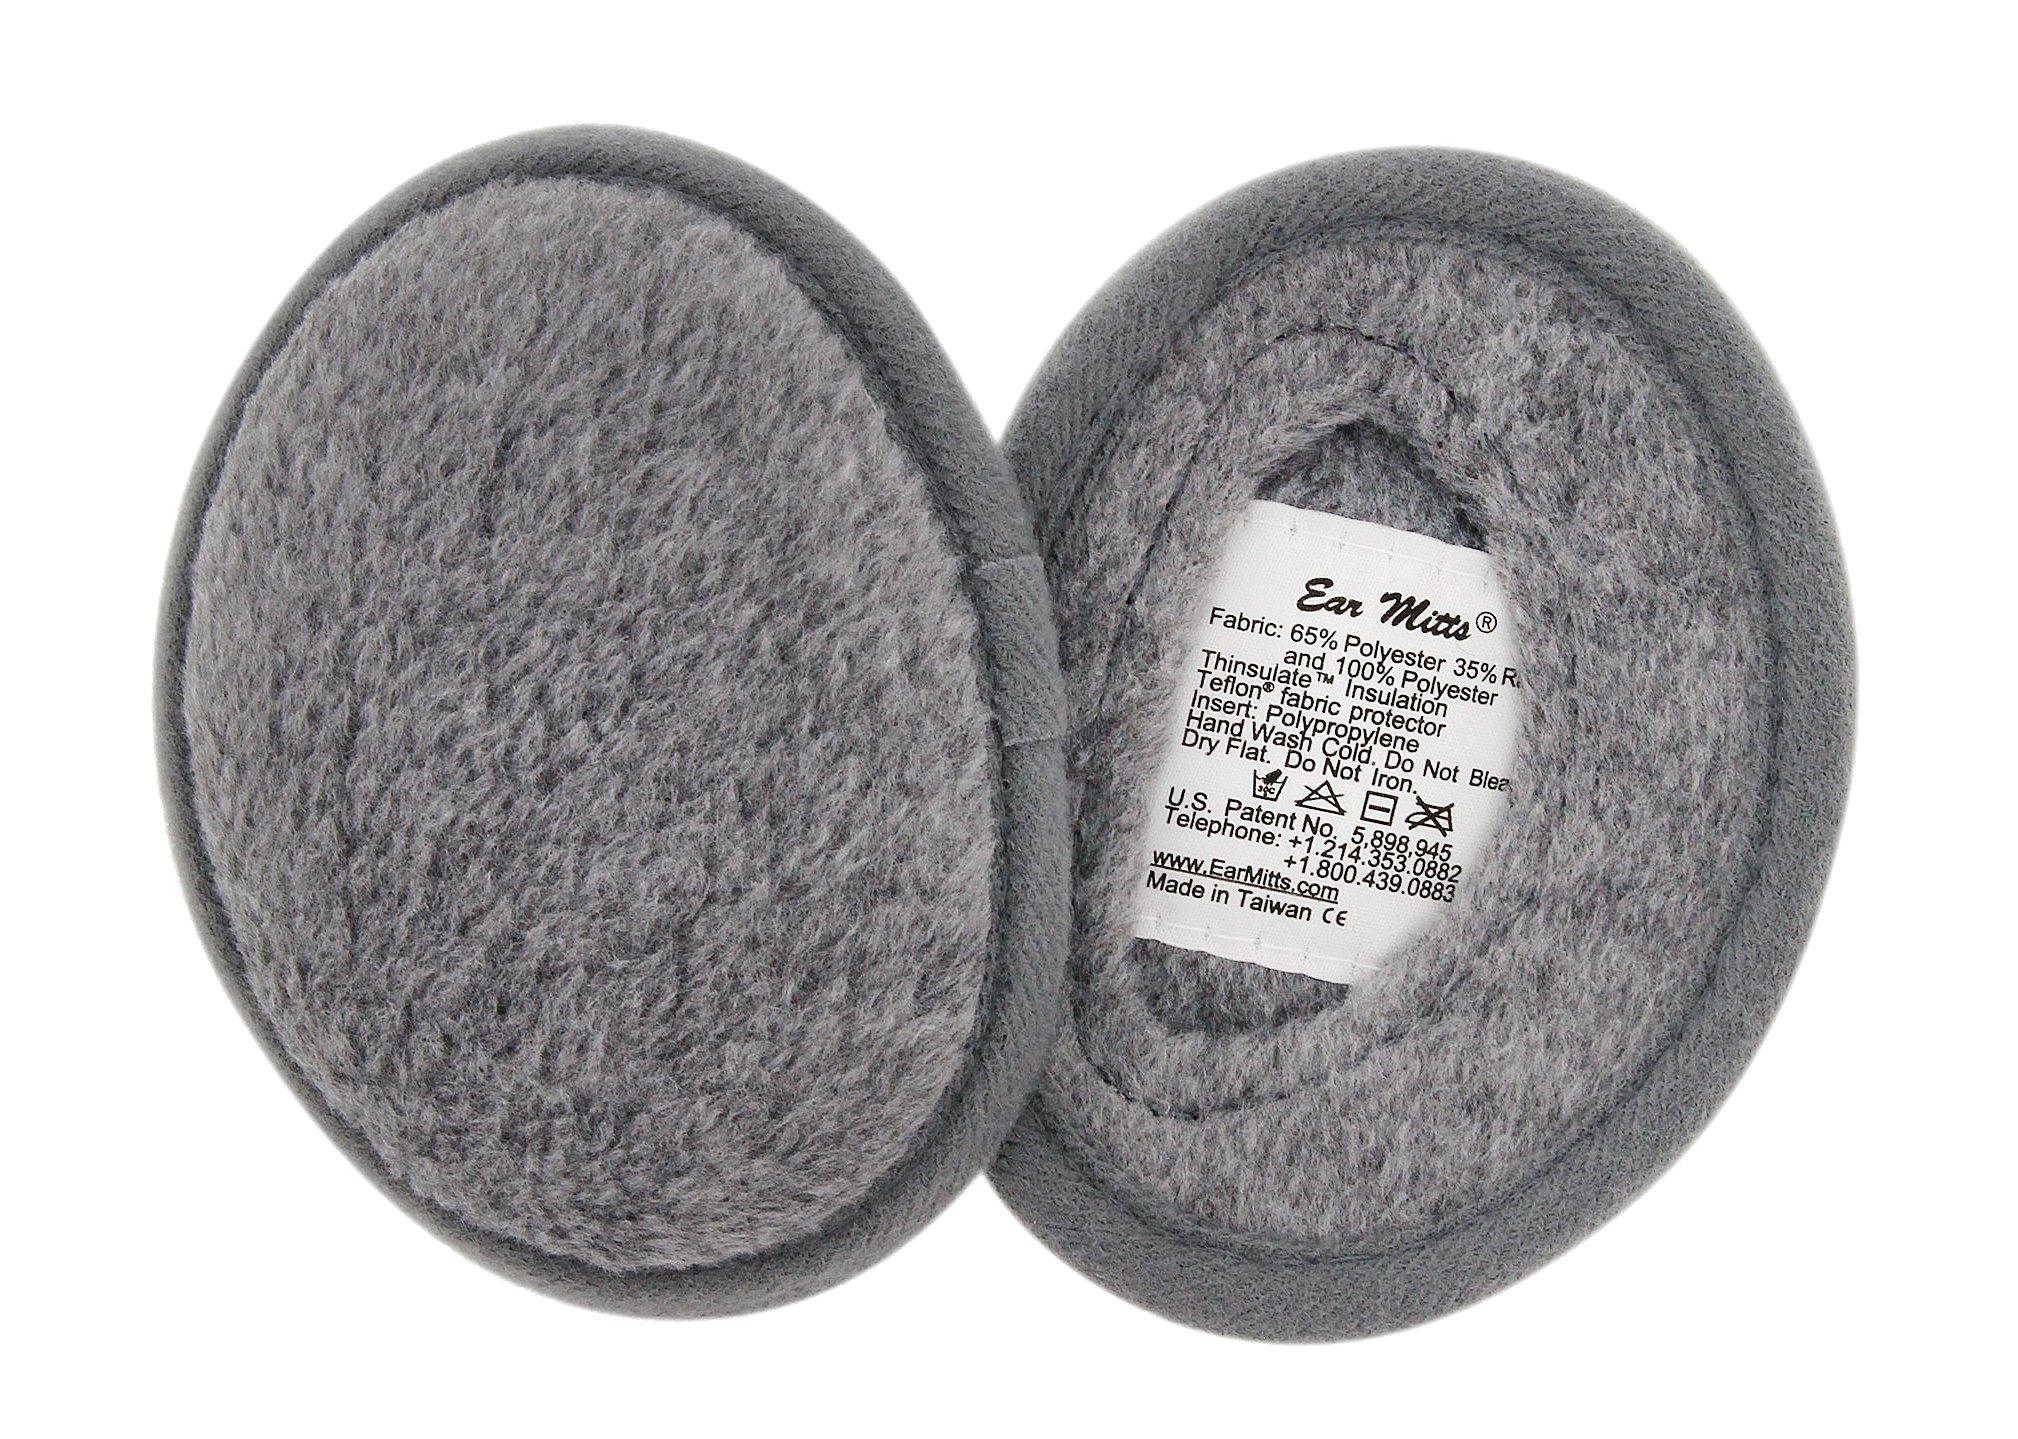 Ear Mitts Bandless Ear Muffs For Men & Women, Gray Fleece Ear Warmers, Regular